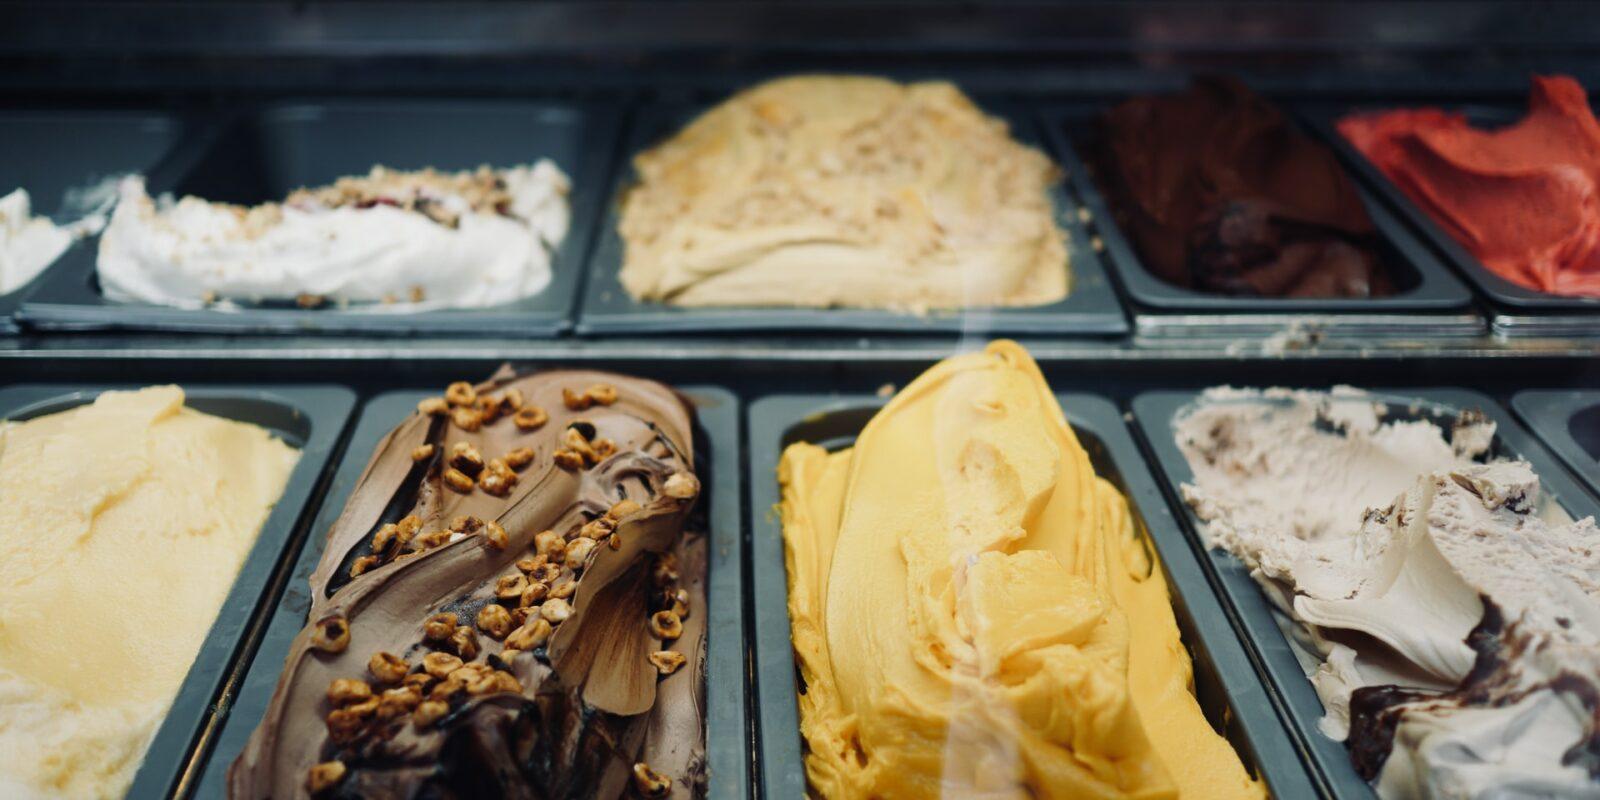 Best Ice Cream in Chicago